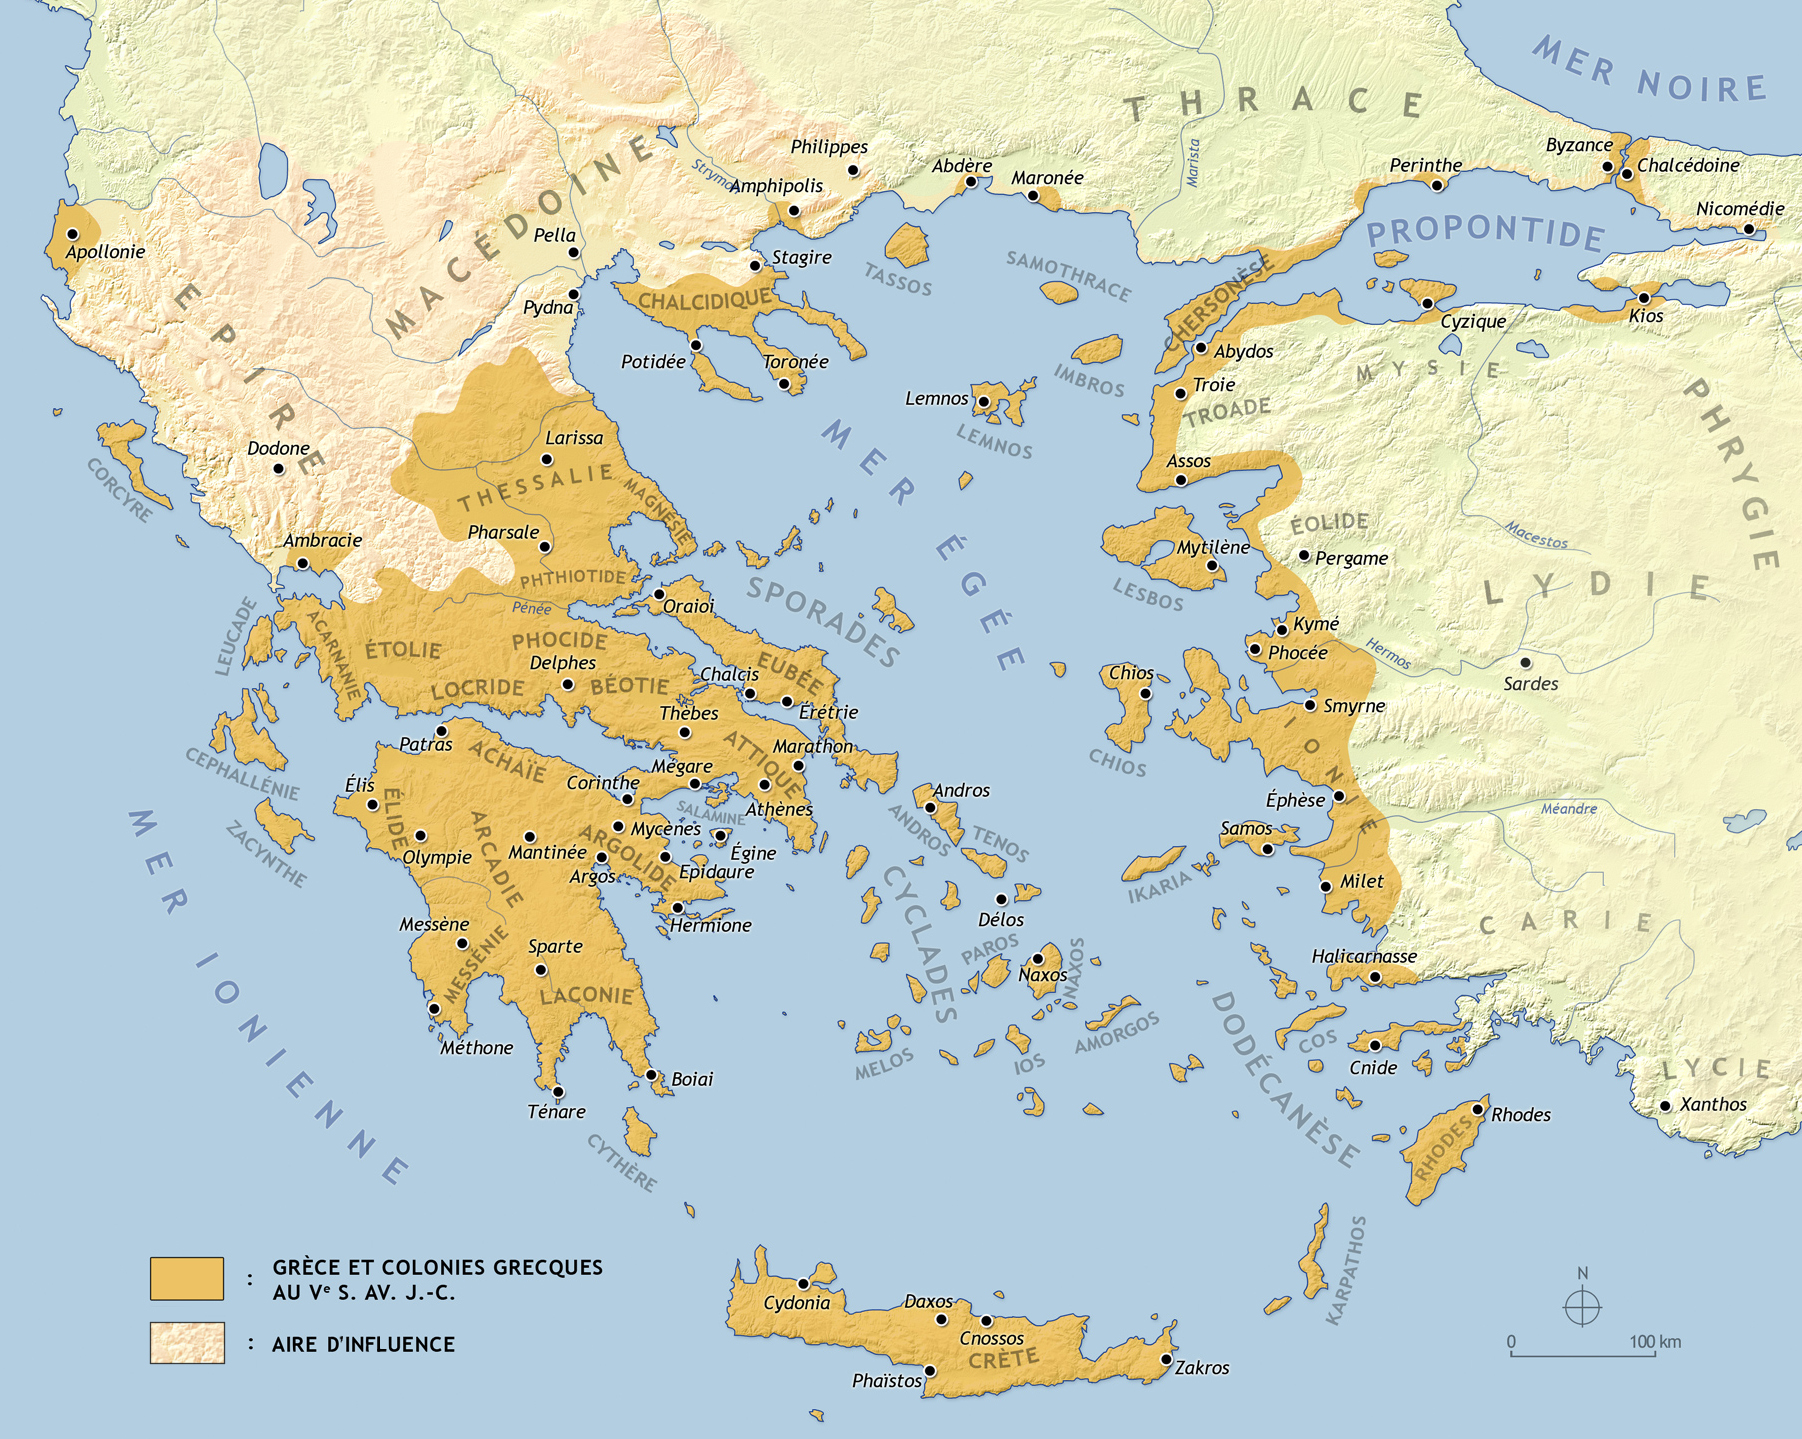 carte du monde grec antique File:Carte Grece antique 02.   Wikimedia Commons